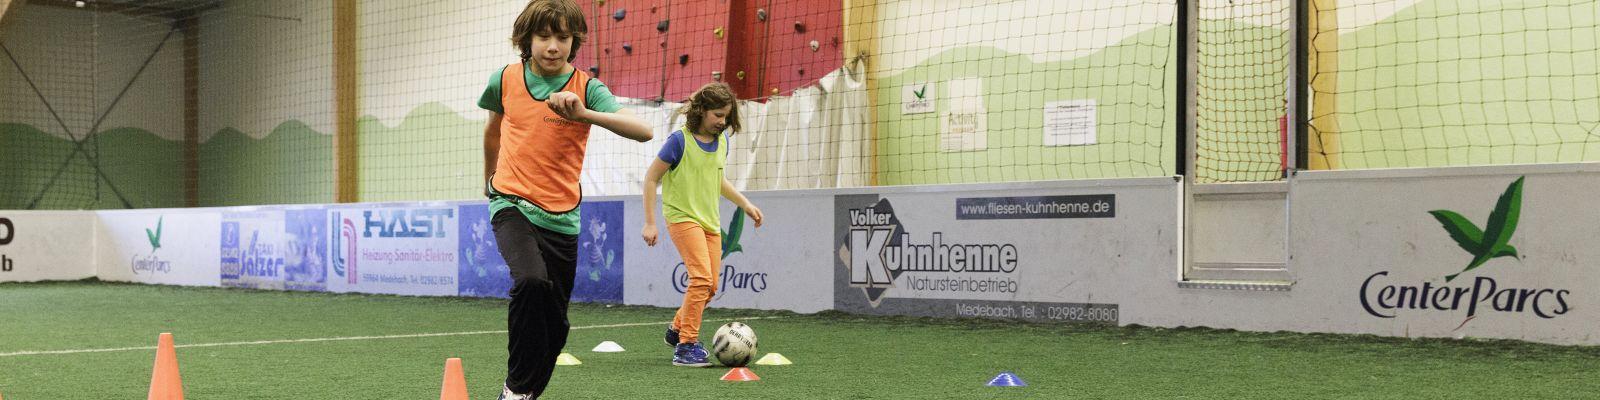 Academy Voetbal